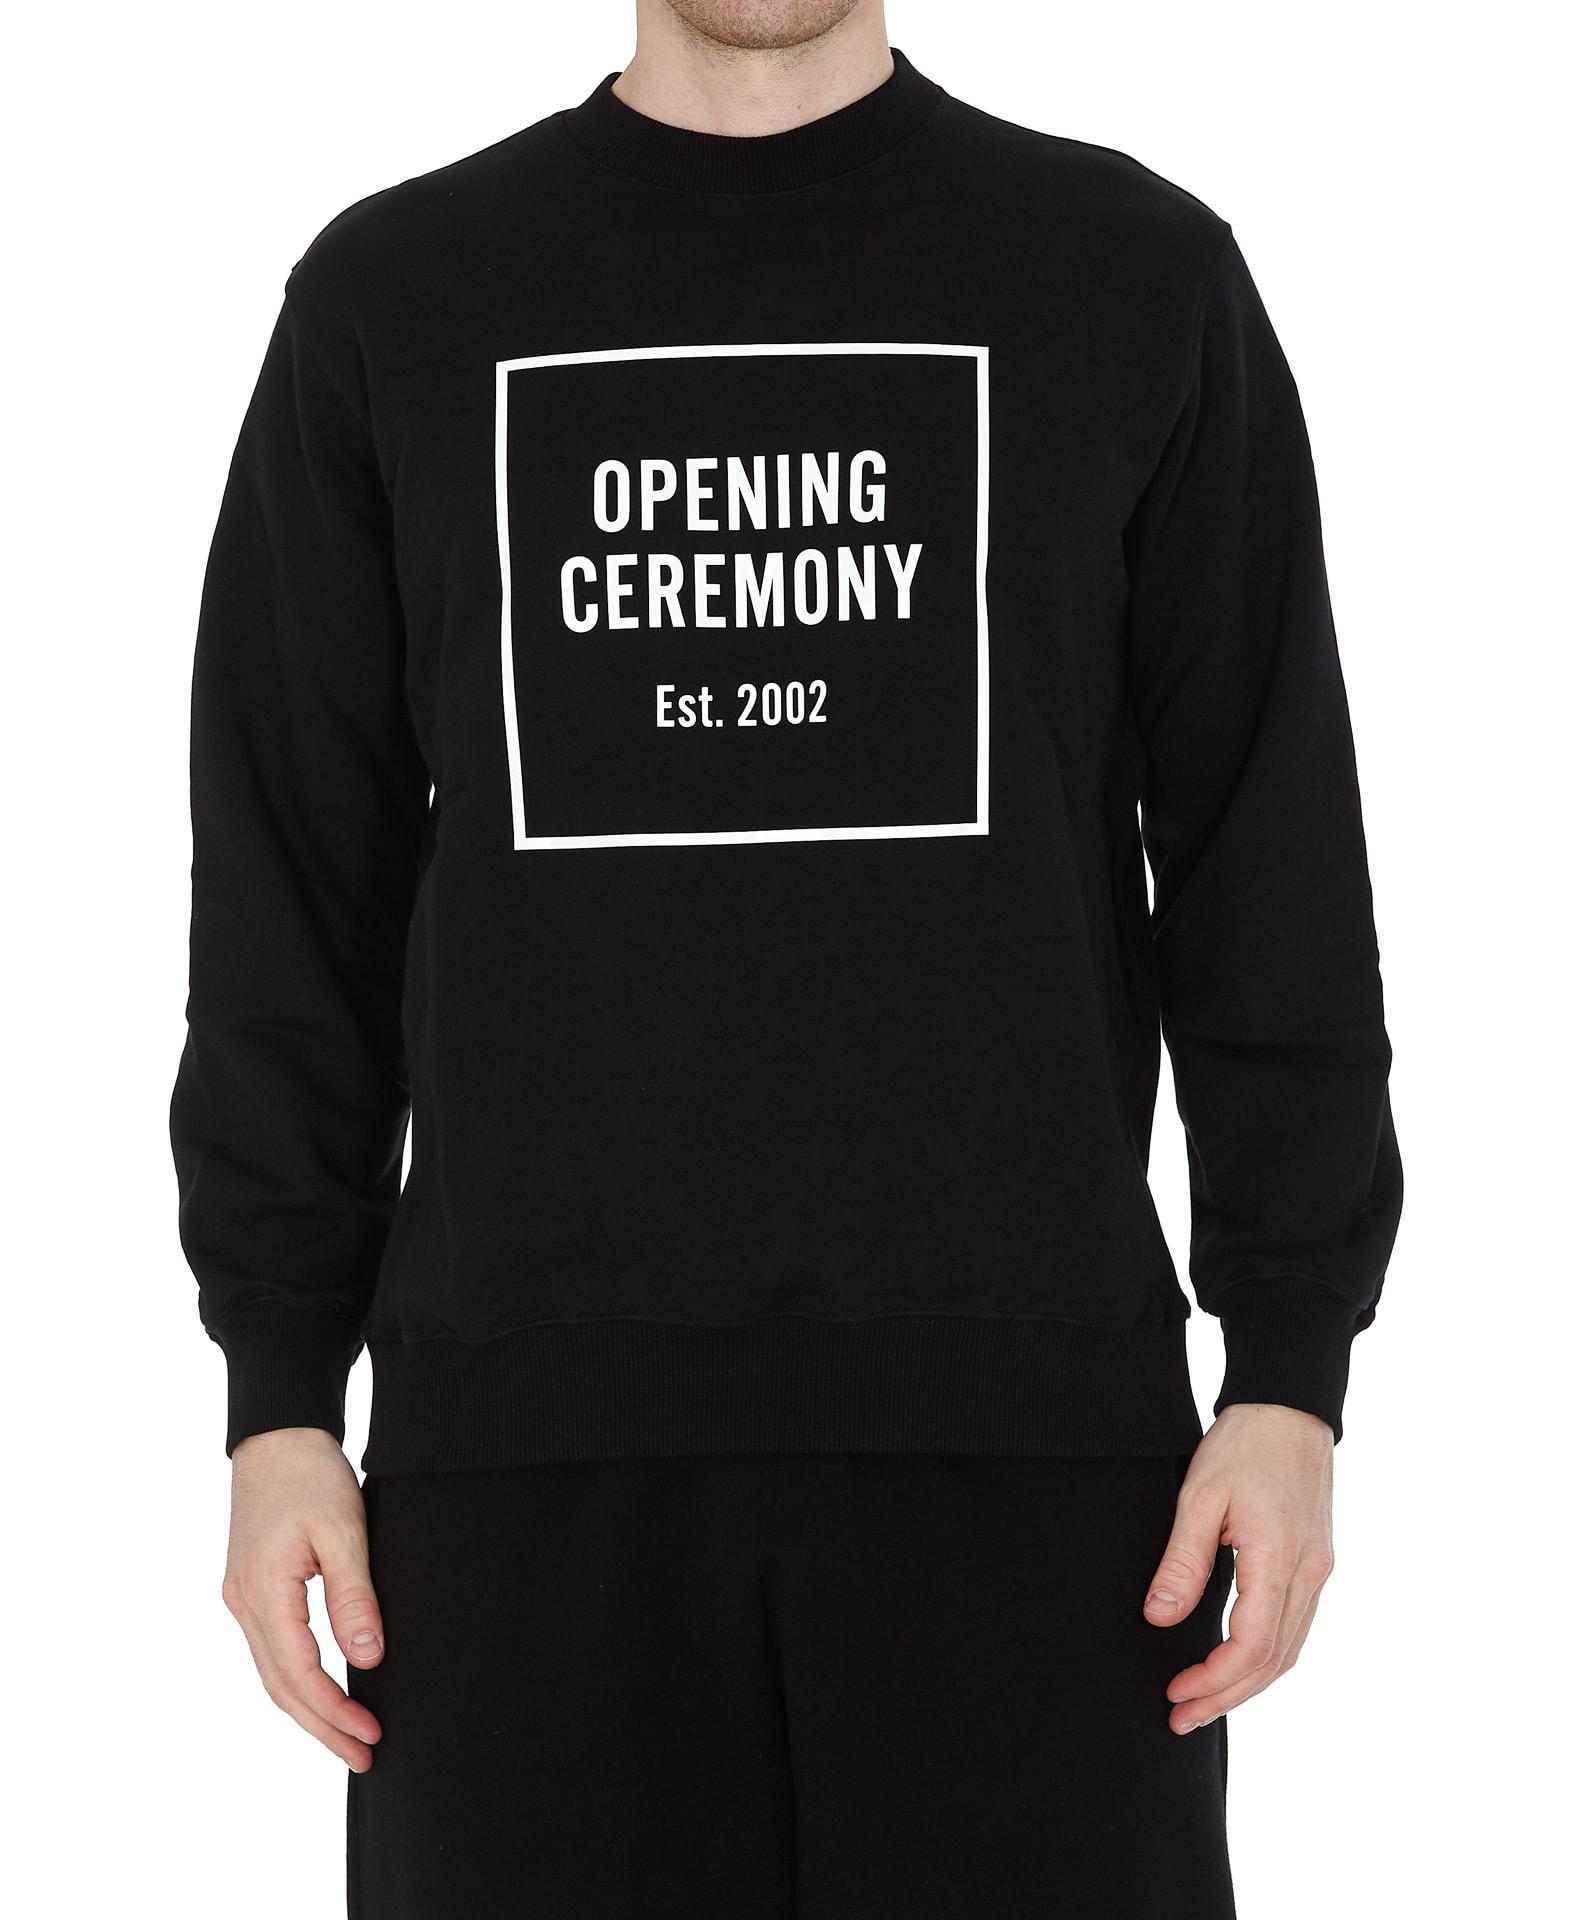 Opening Ceremony Box Lgoo Sweatshirt